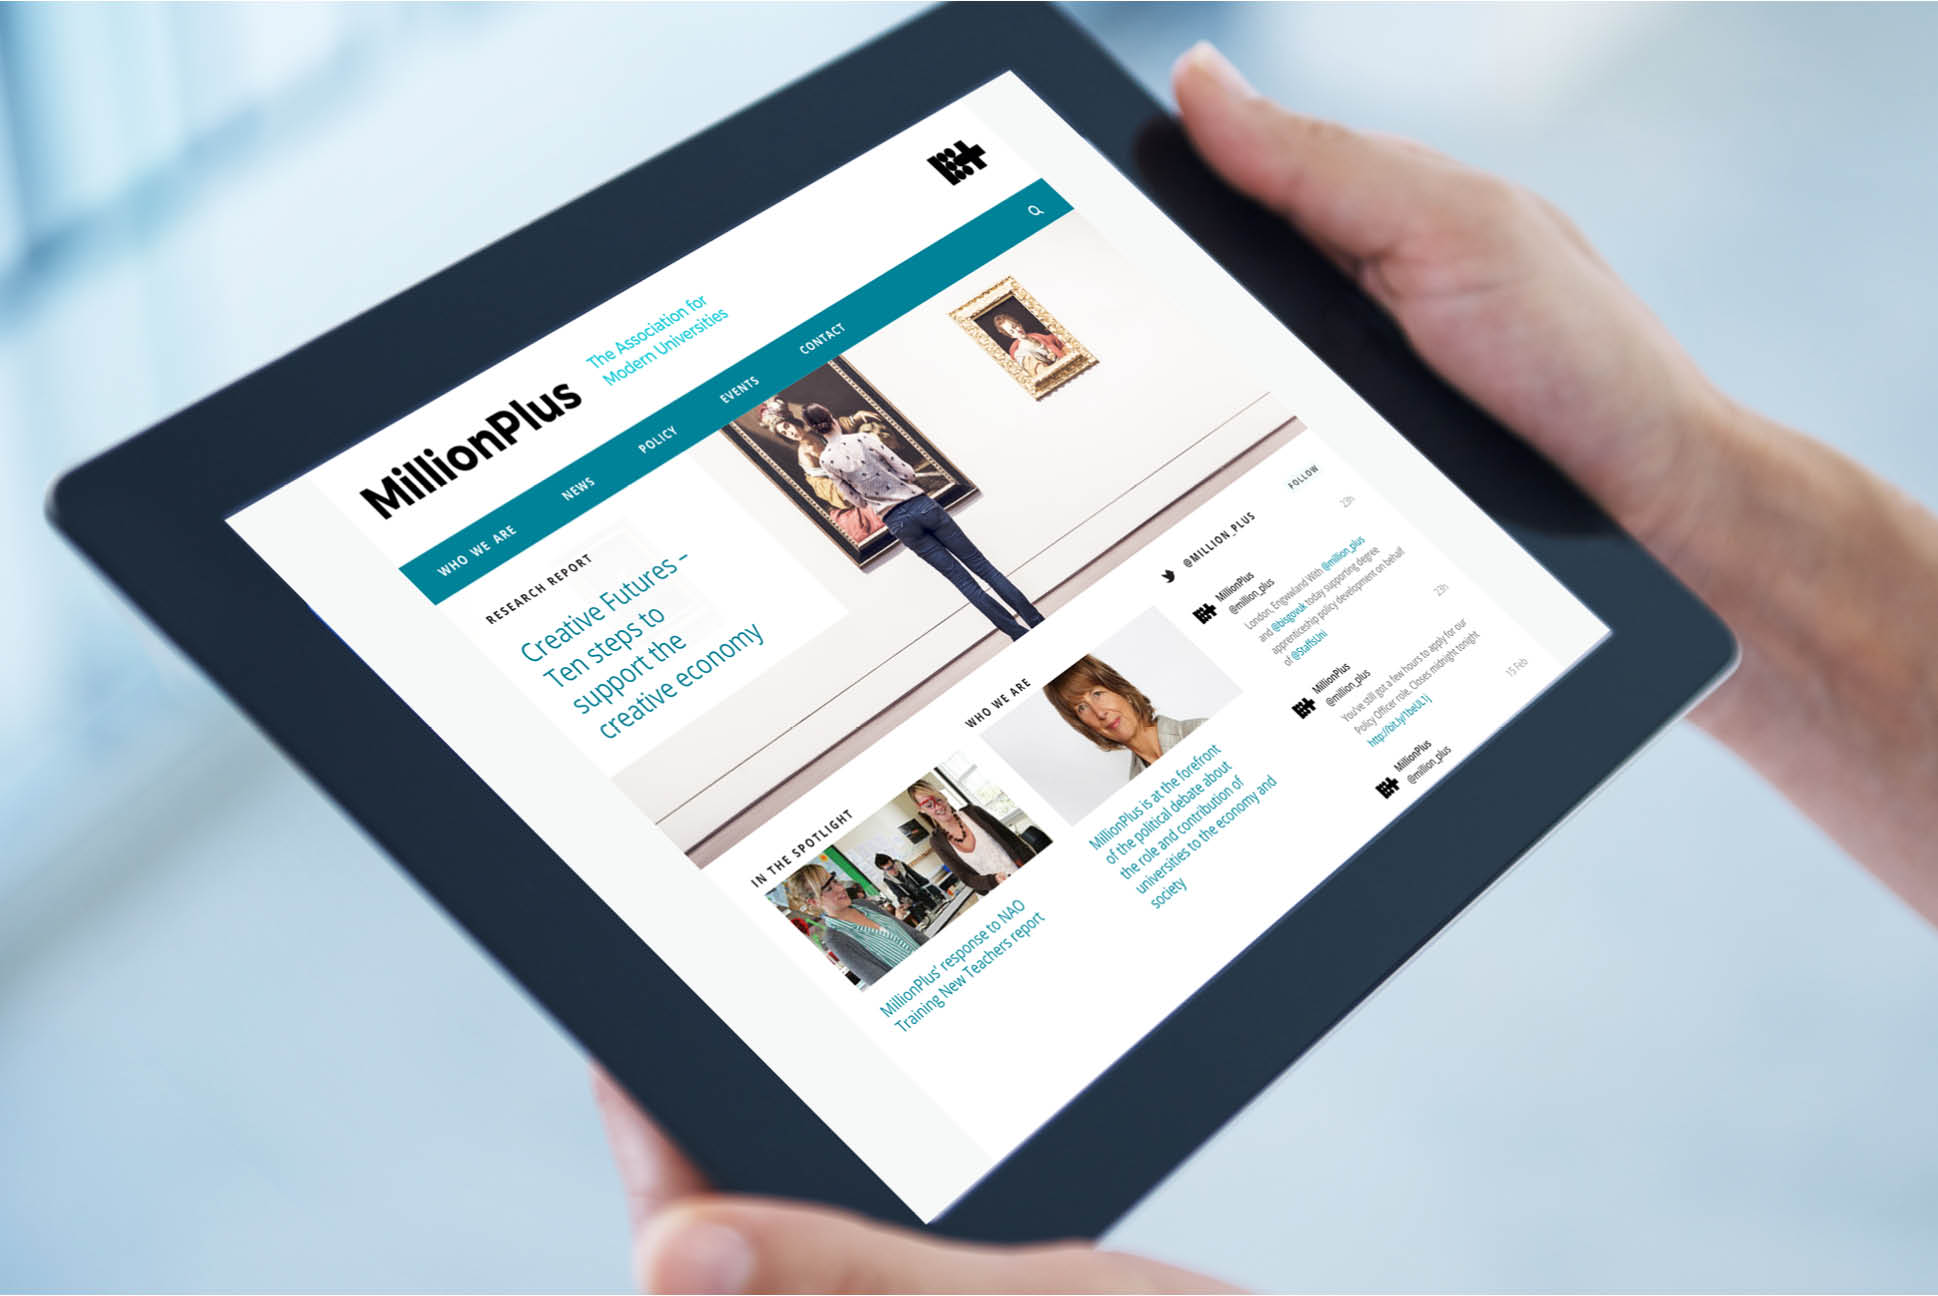 MillionPlus website   Education Branding London   Independent Marketing London   IM London